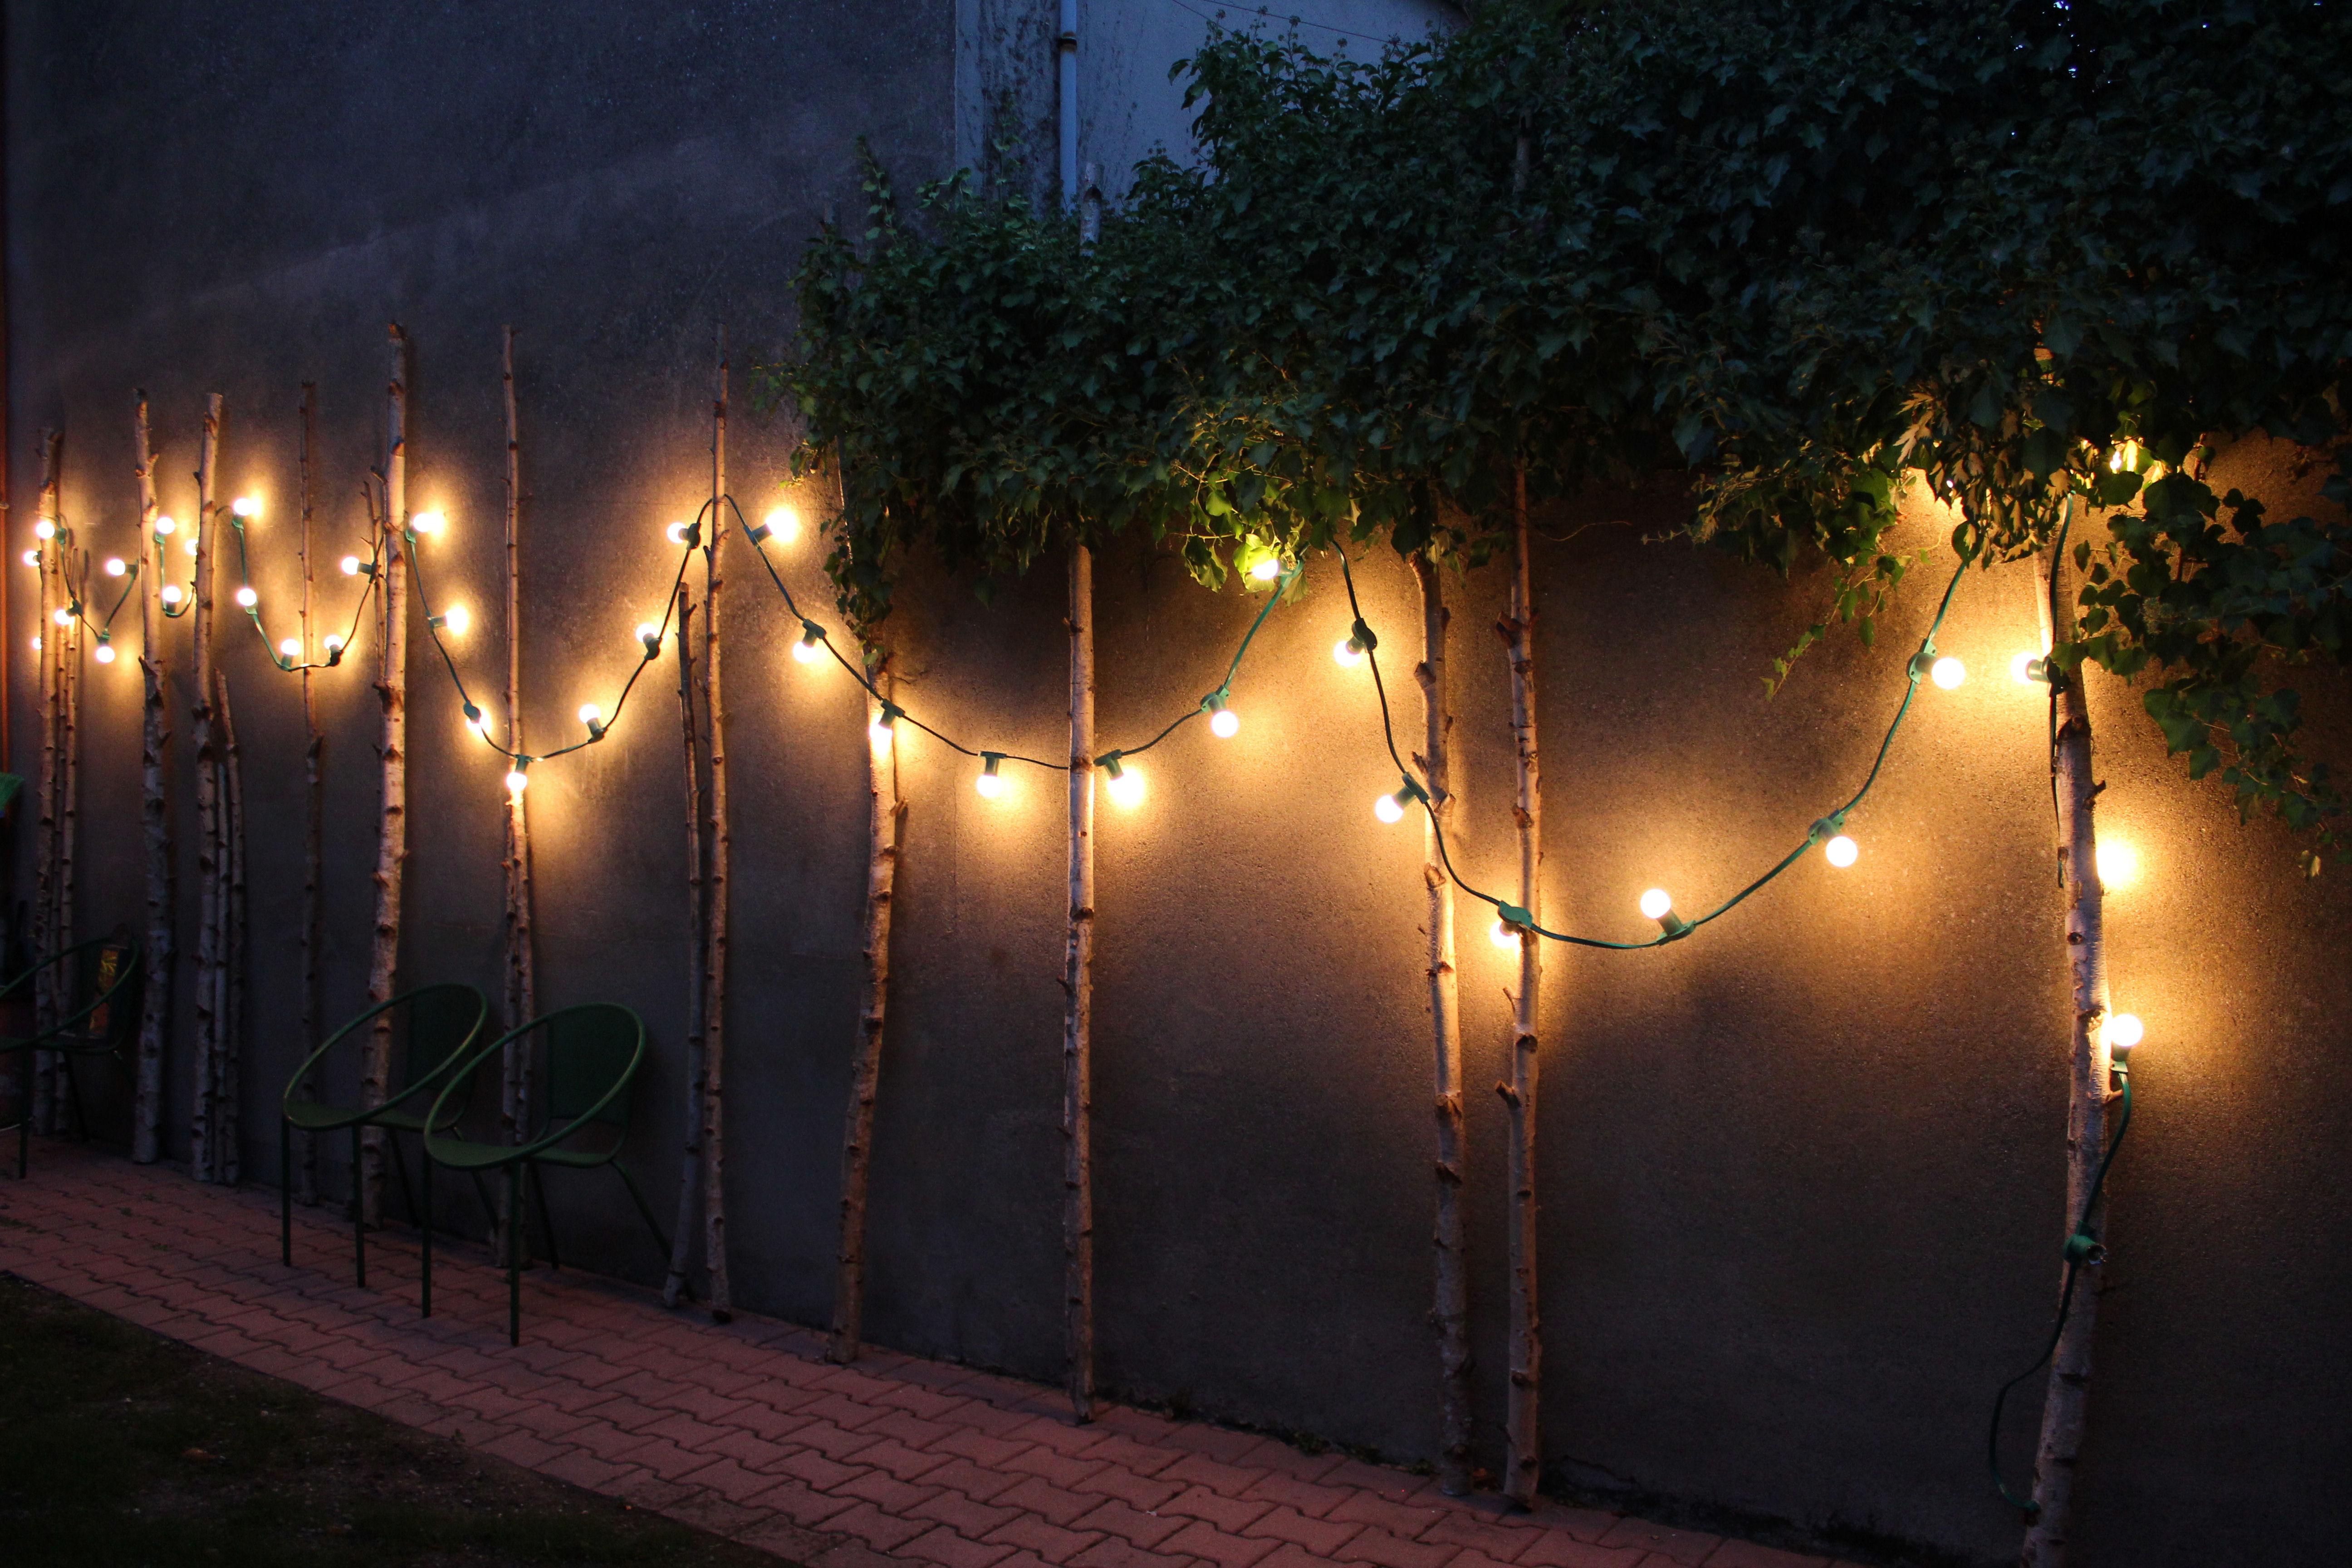 diy bouleaux et guirlande lumineuse poppy figue flower. Black Bedroom Furniture Sets. Home Design Ideas